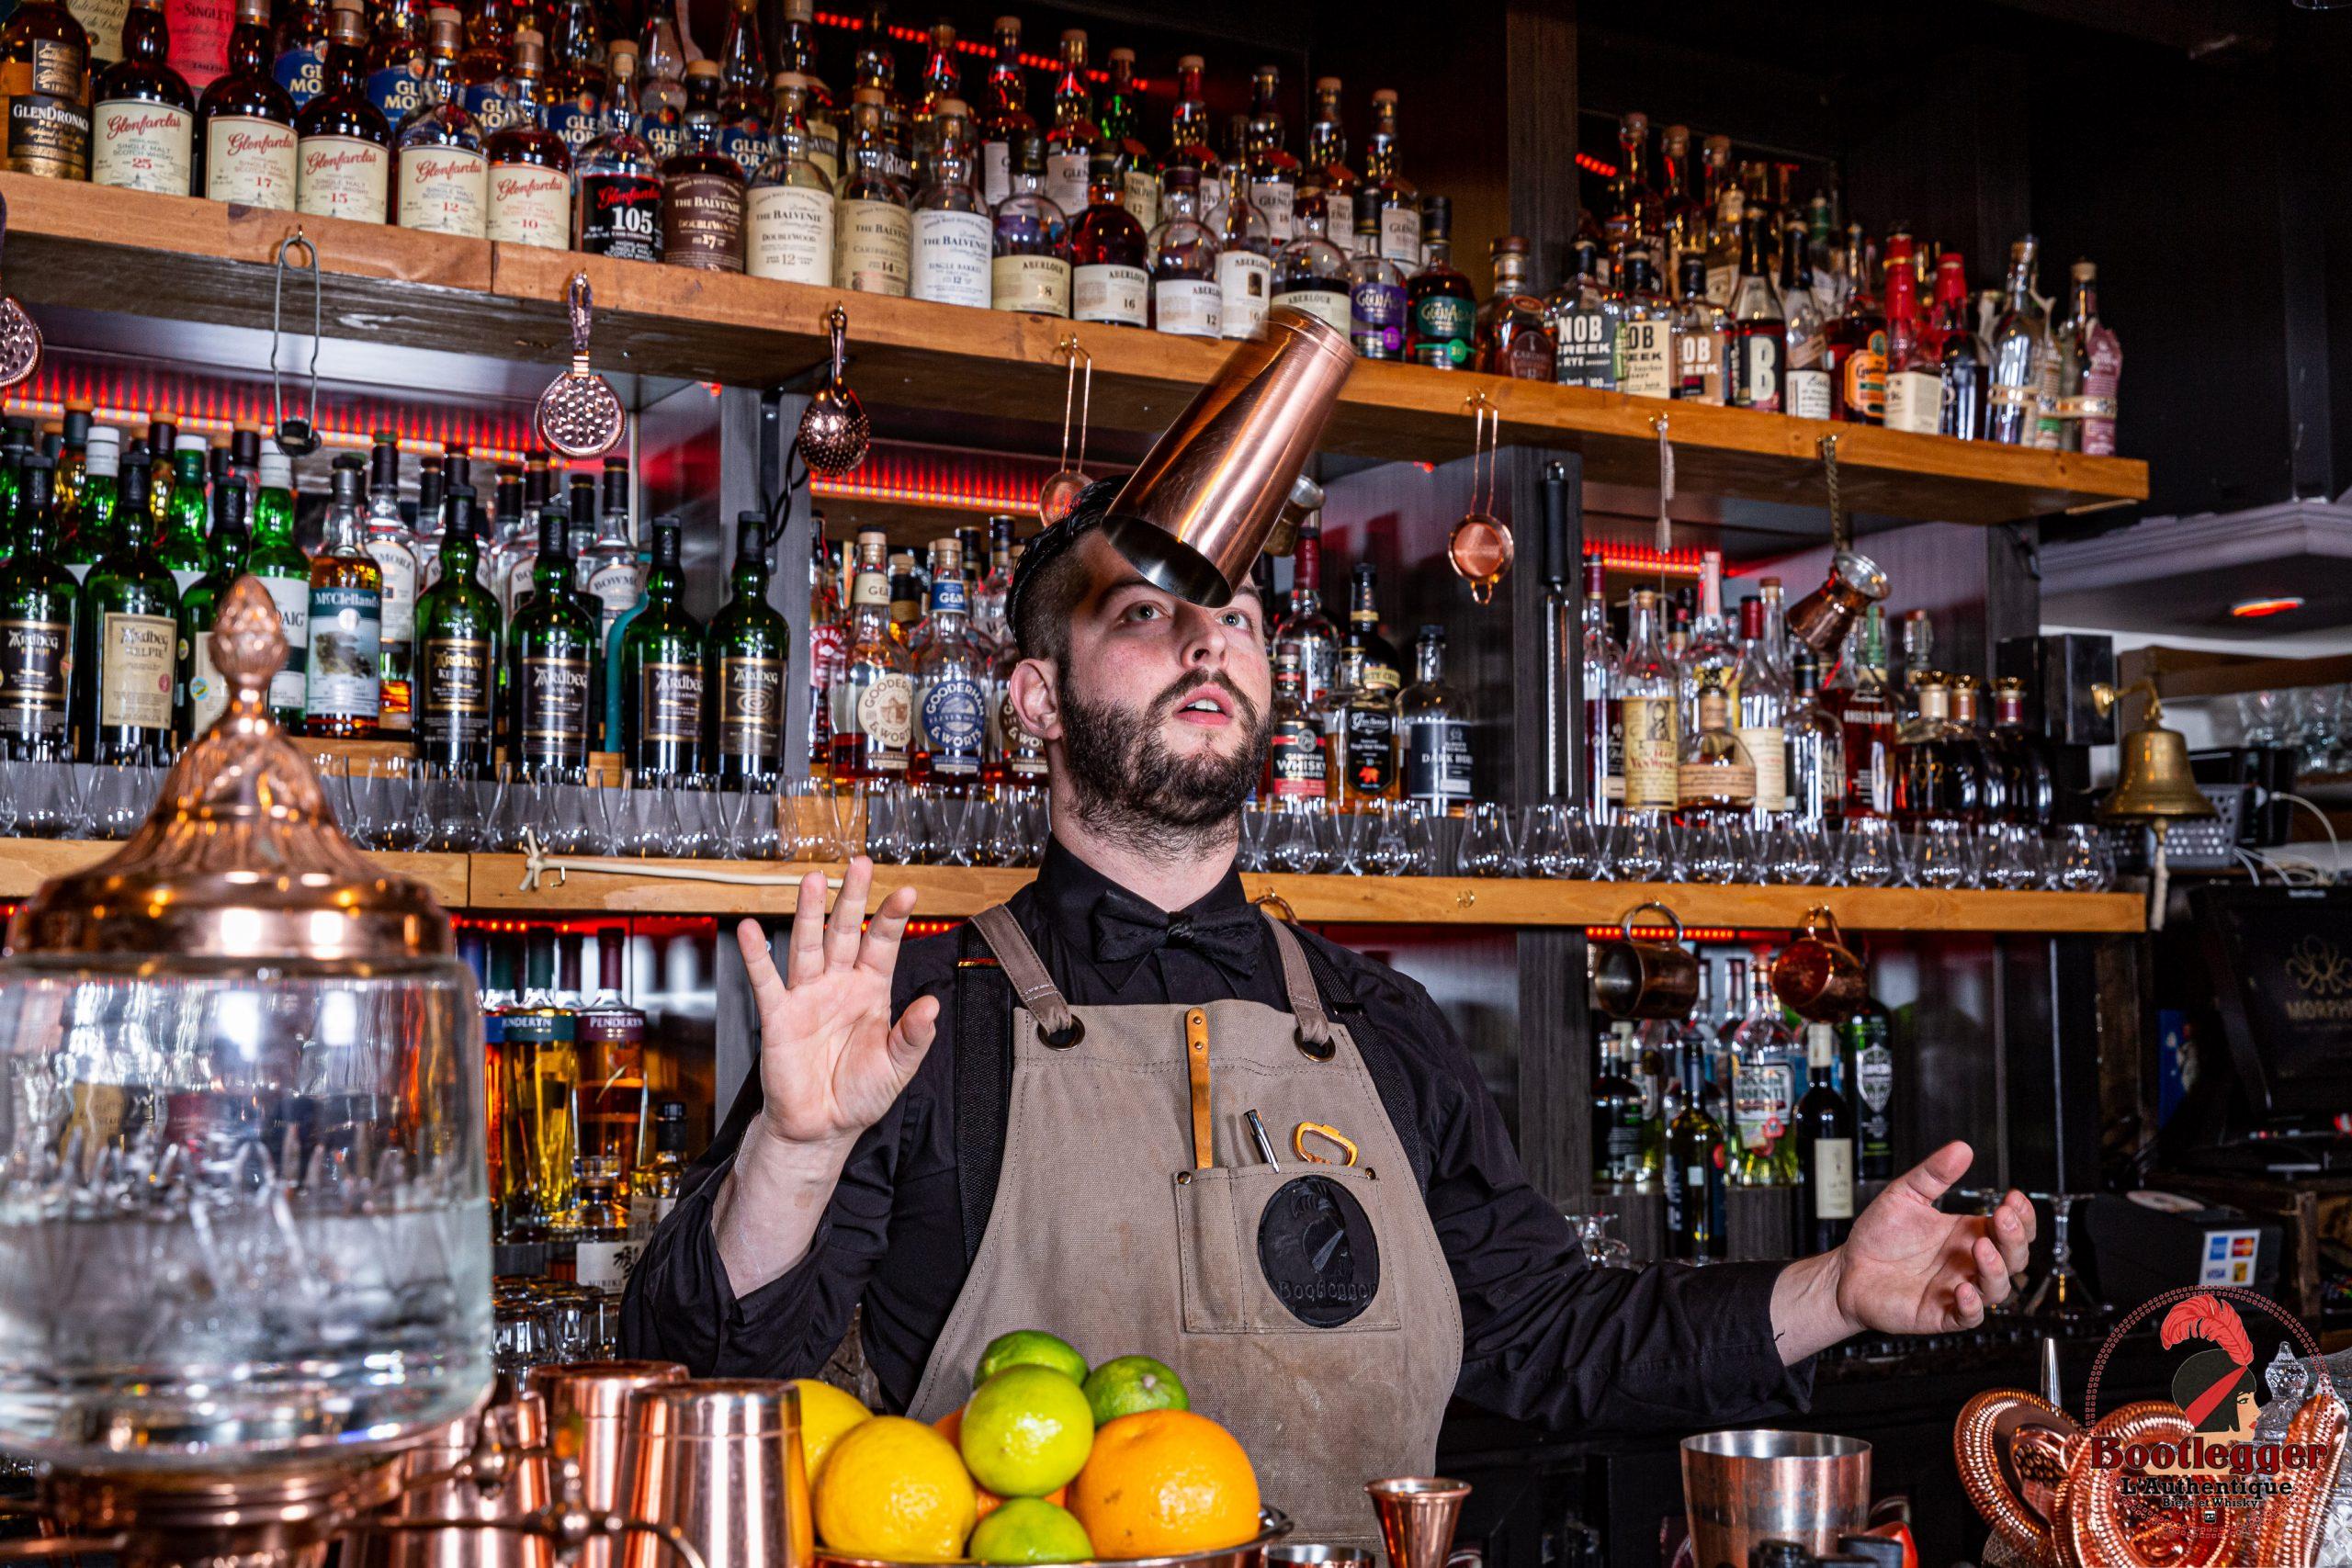 christ desjardins bartender bootlegger l'authentique